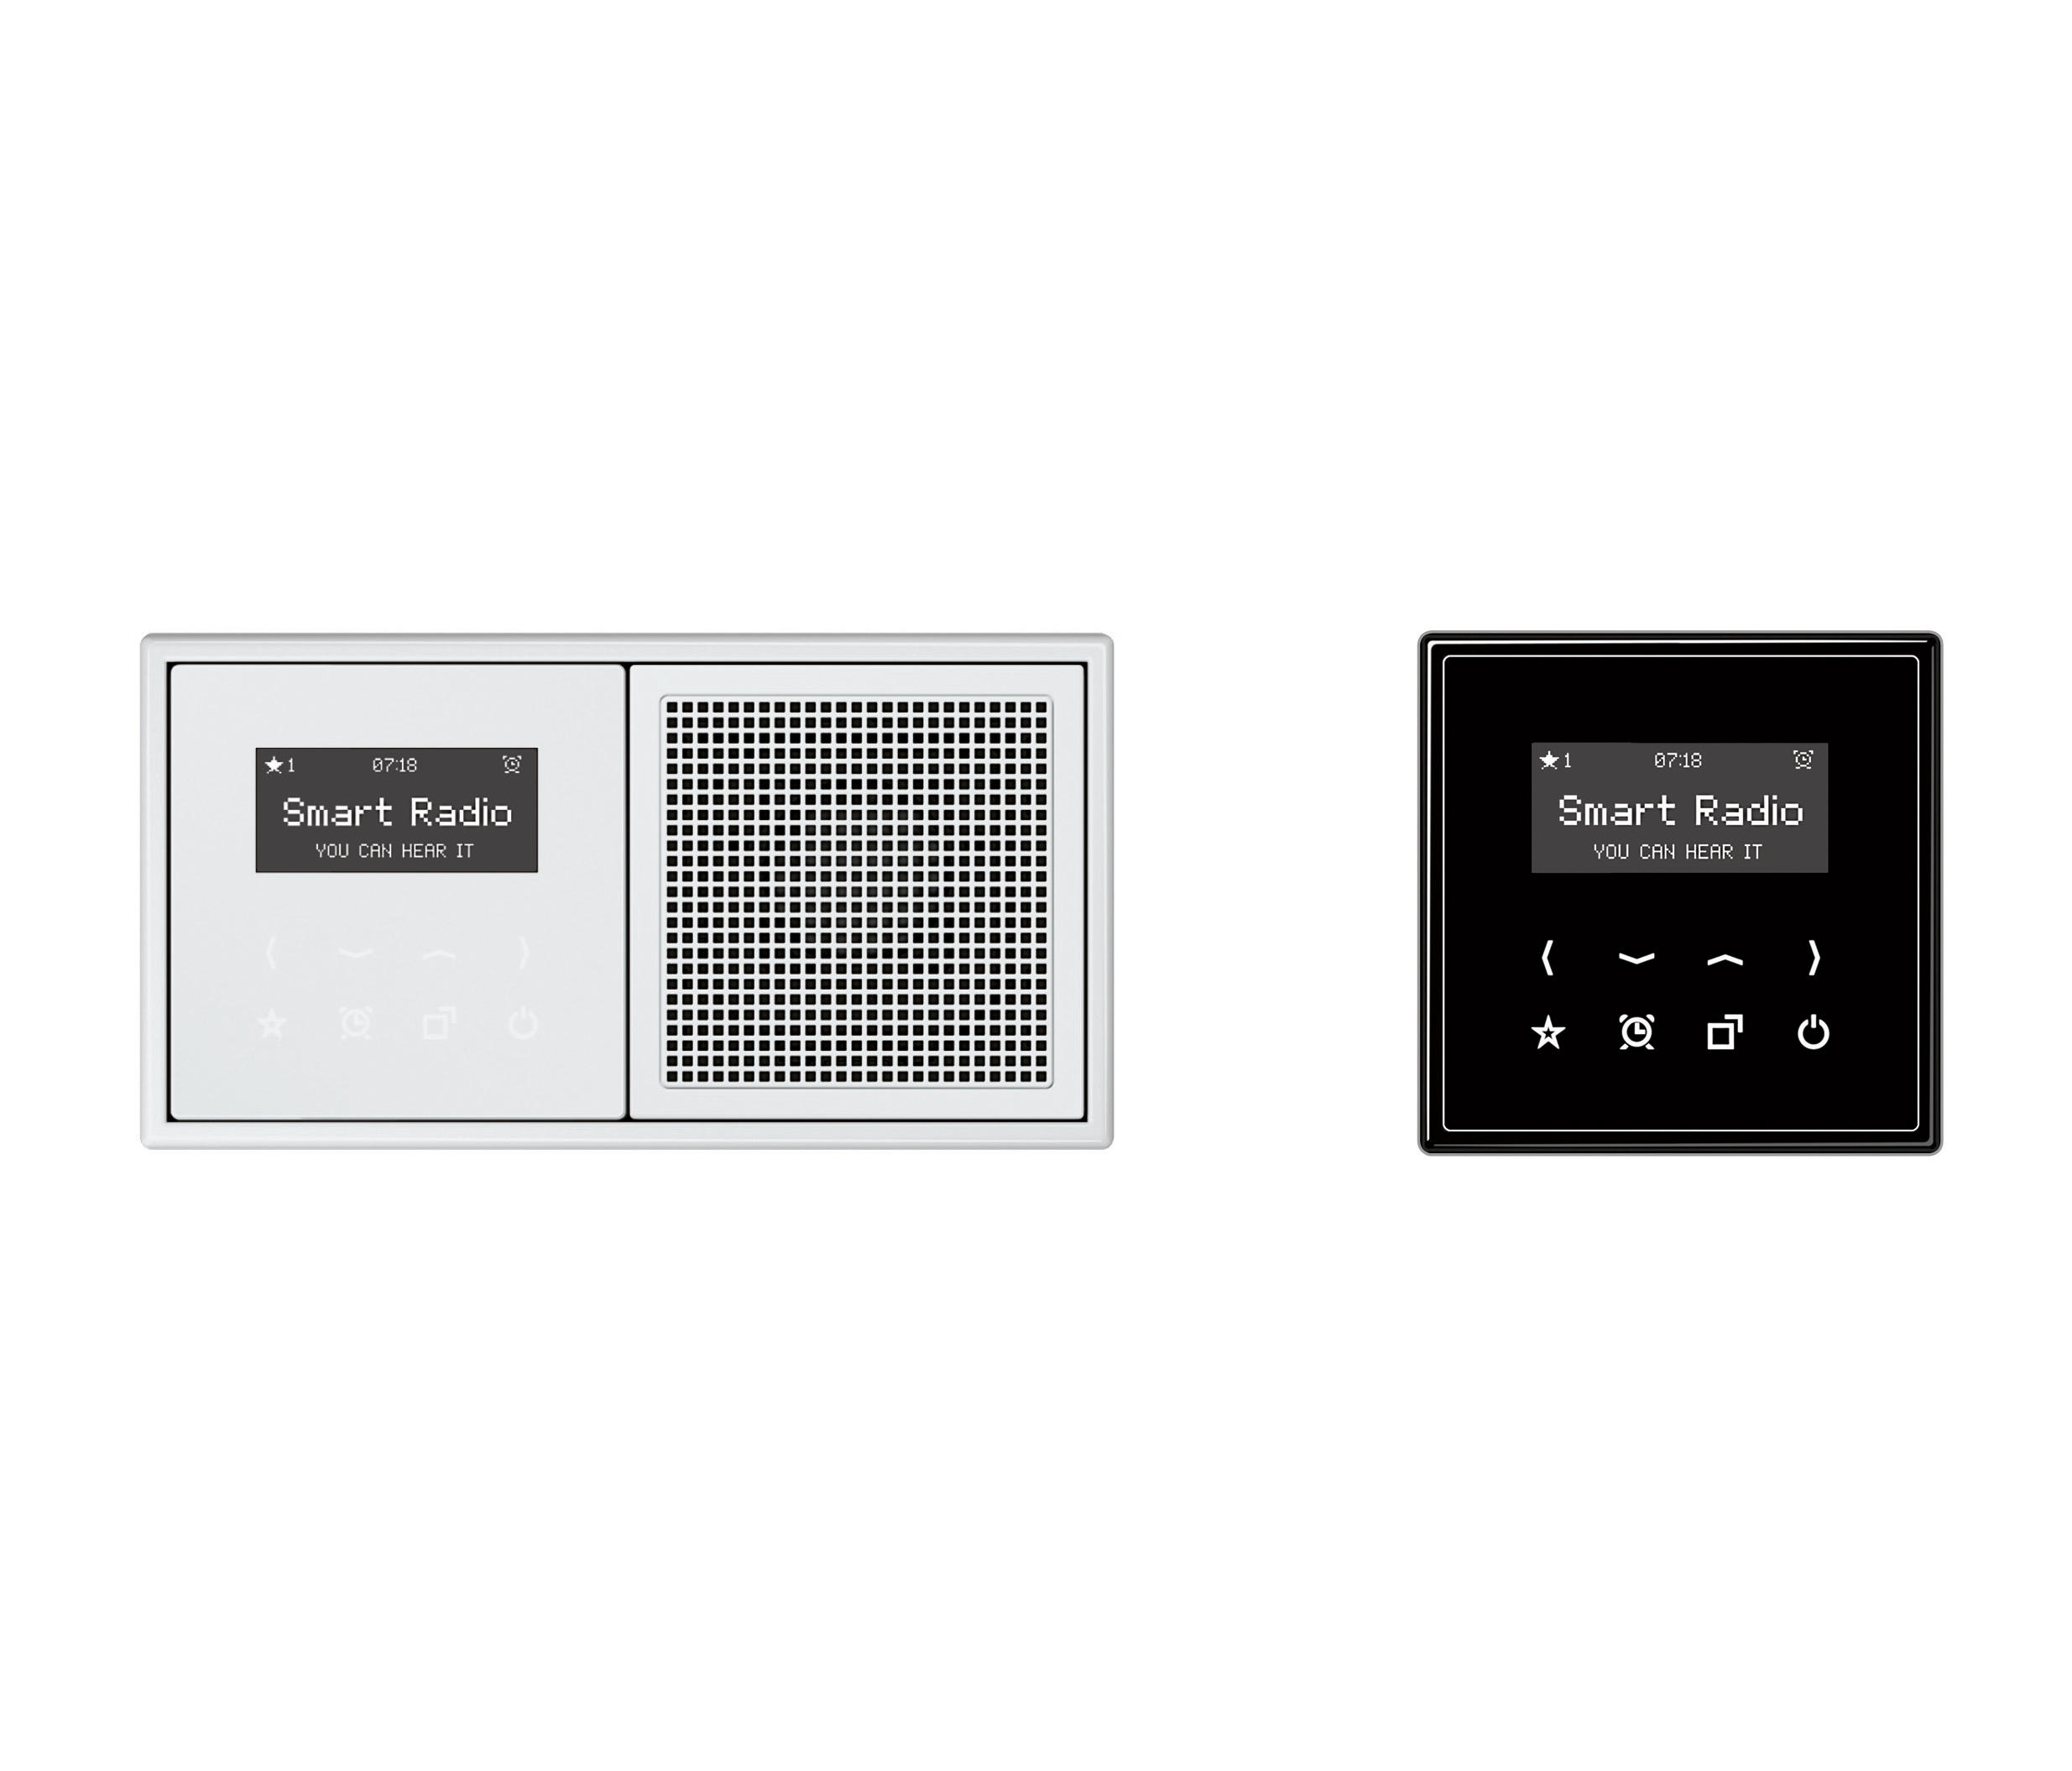 smart radio ls plus soundmanagement multimedia von jung architonic. Black Bedroom Furniture Sets. Home Design Ideas